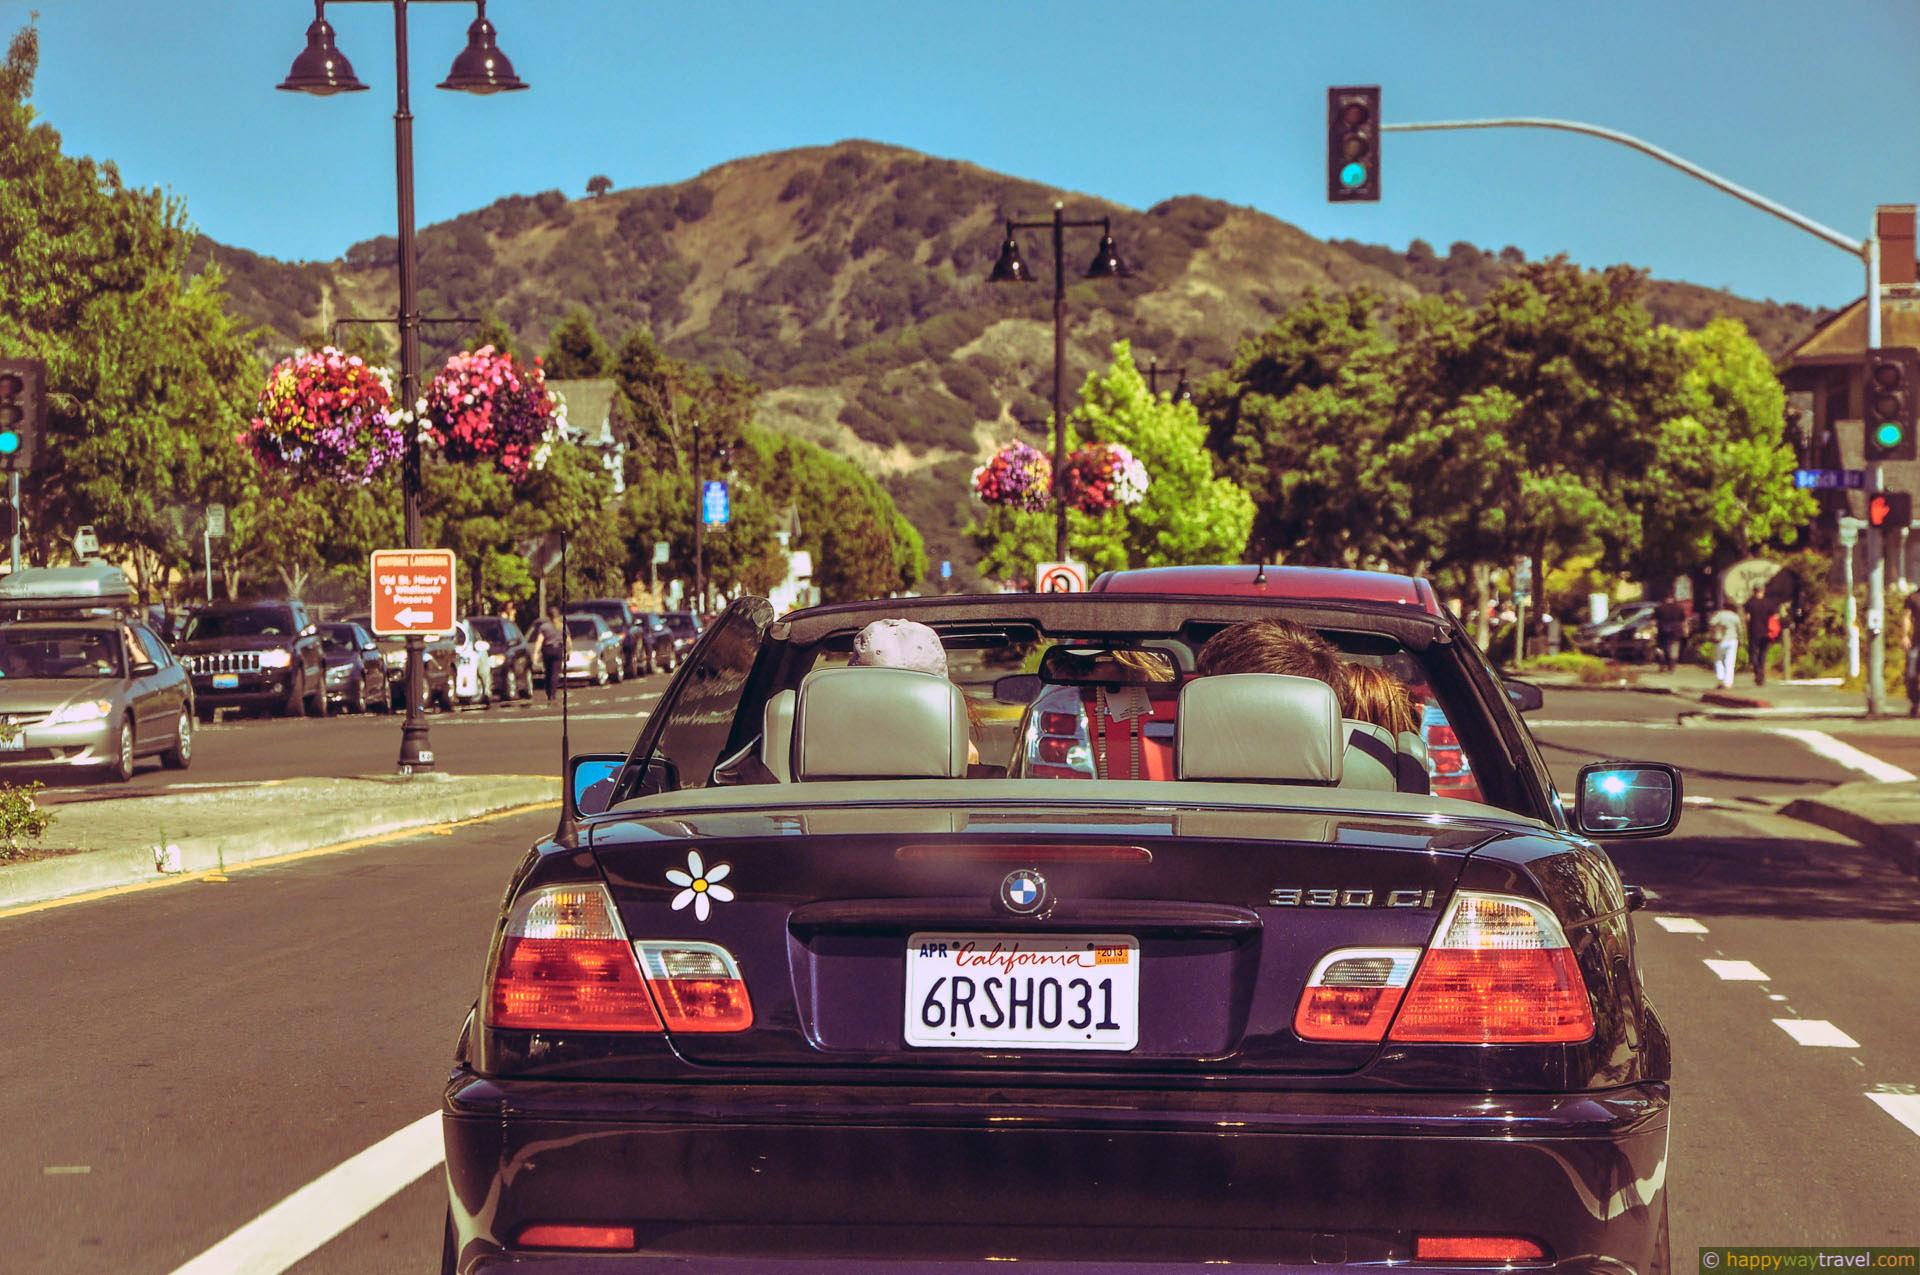 Фотоотчет поездка по америке на машине